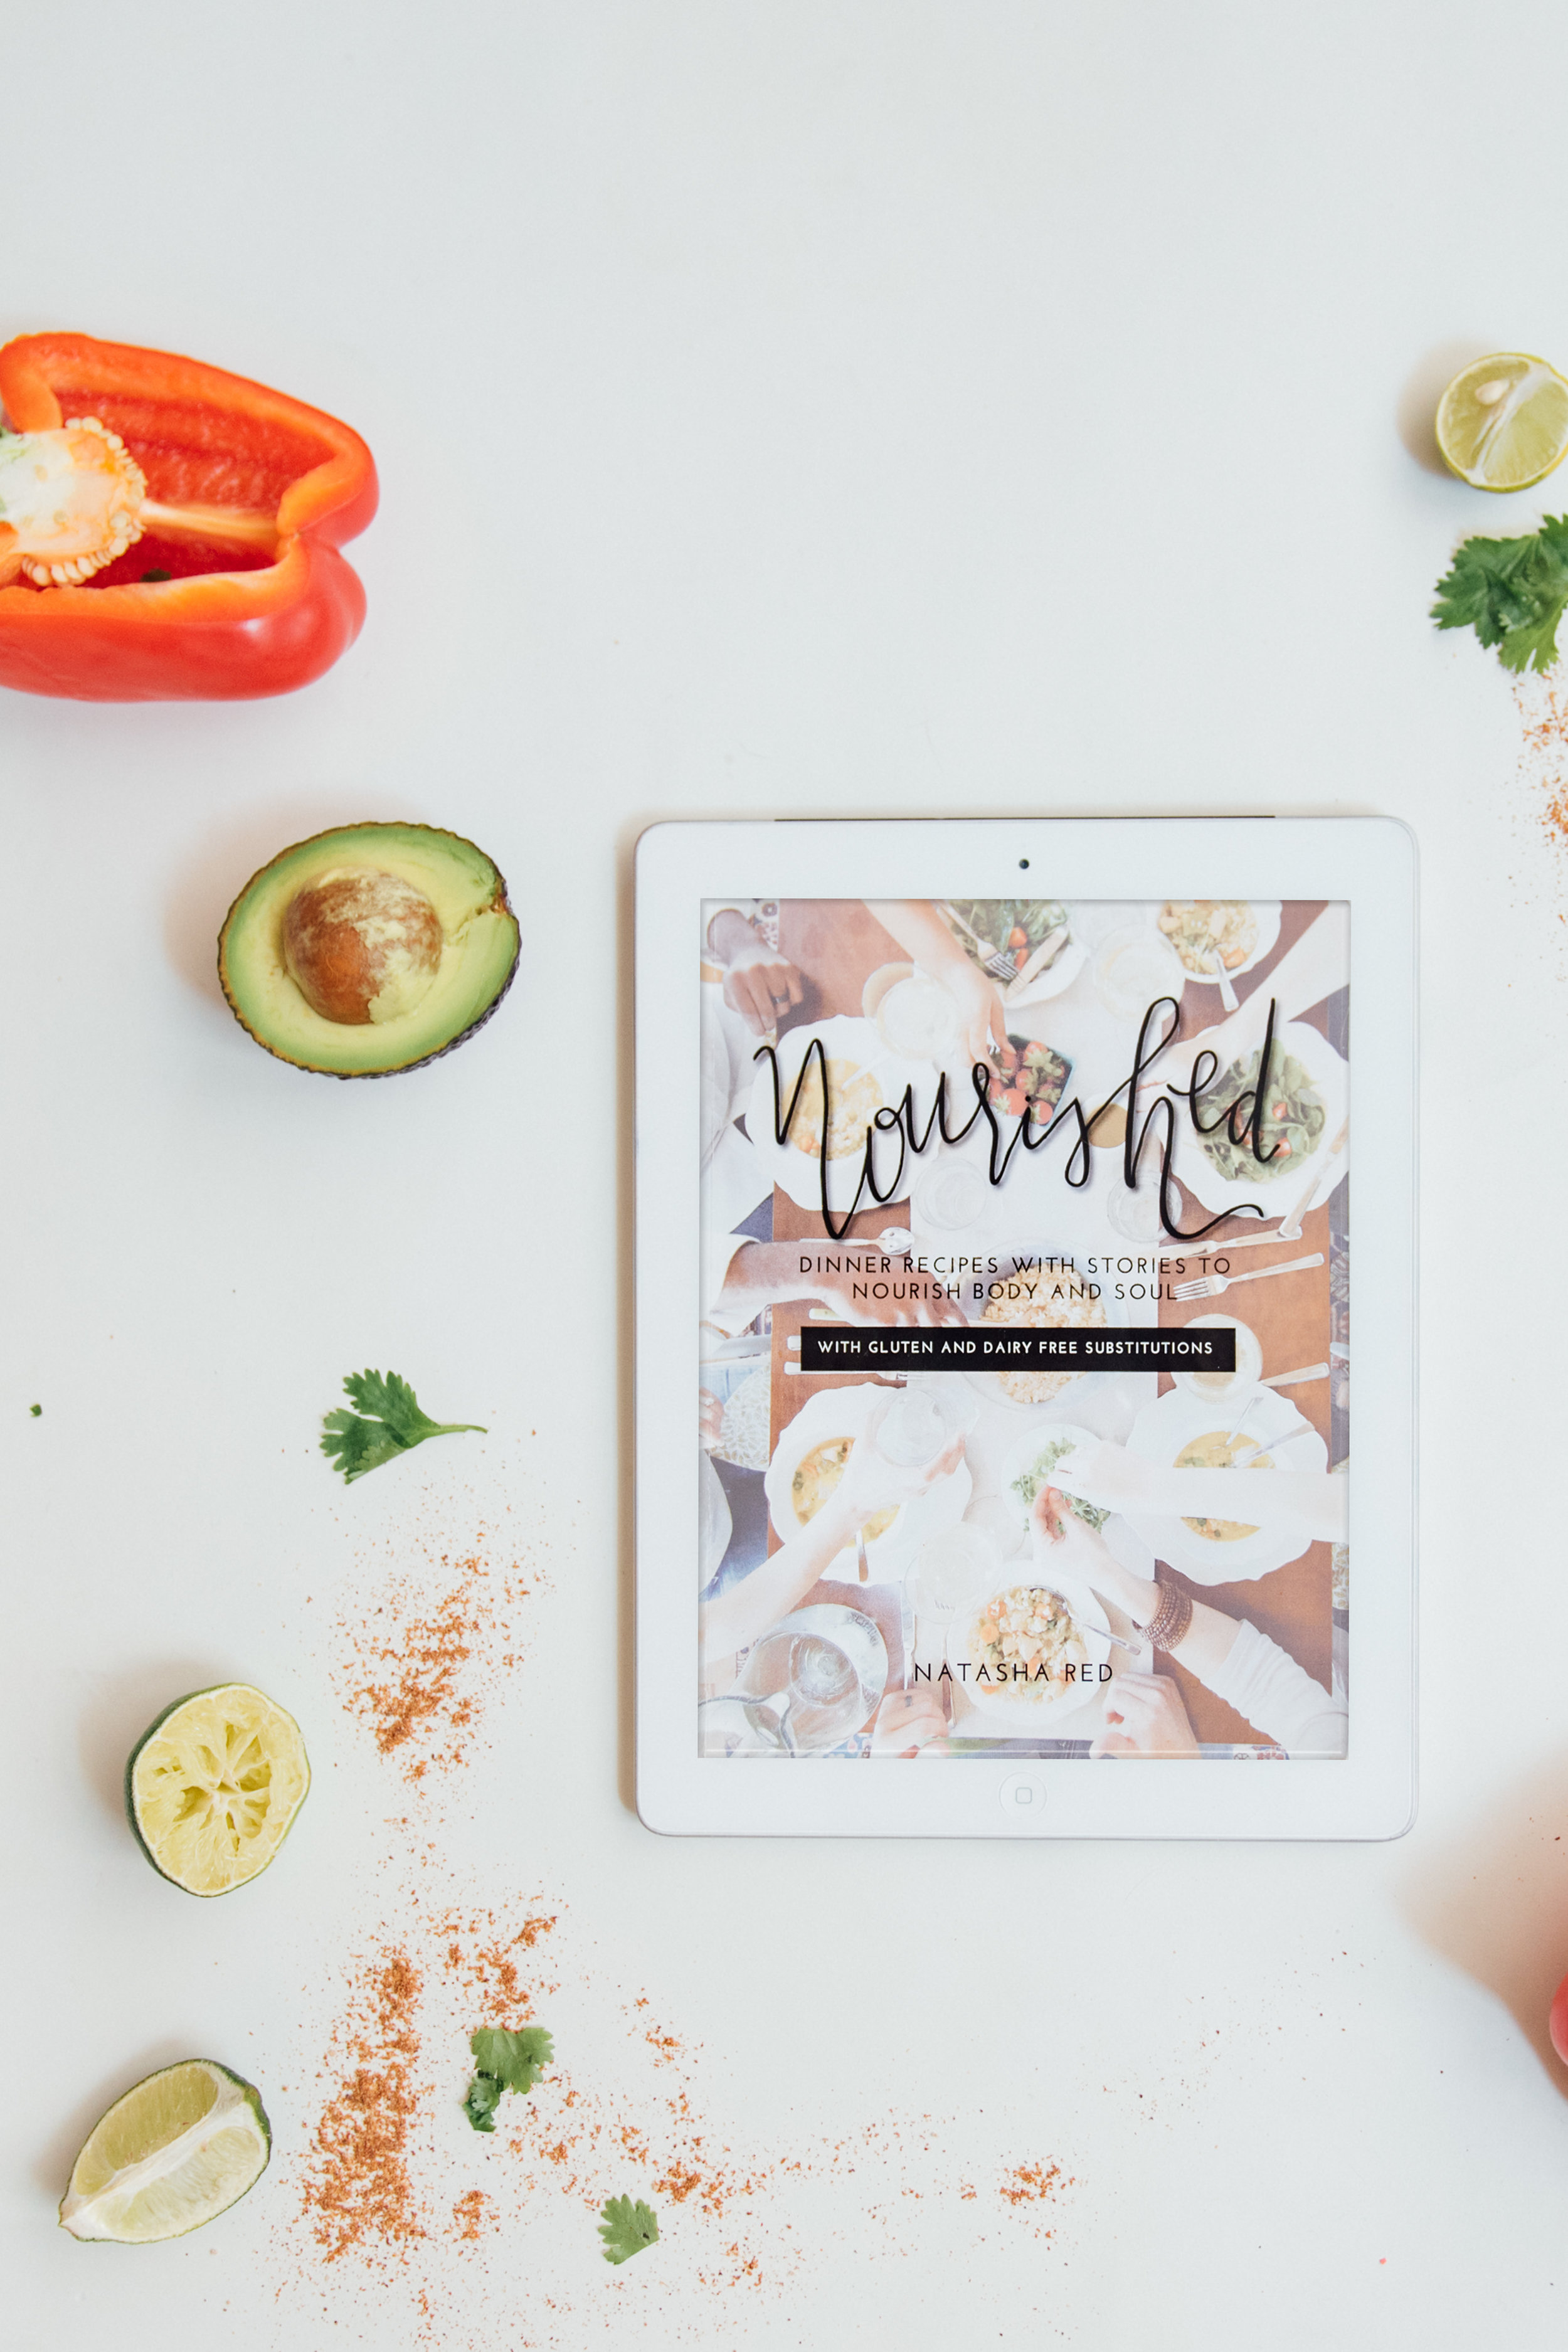 Nourished Cookbook by Natasha Red